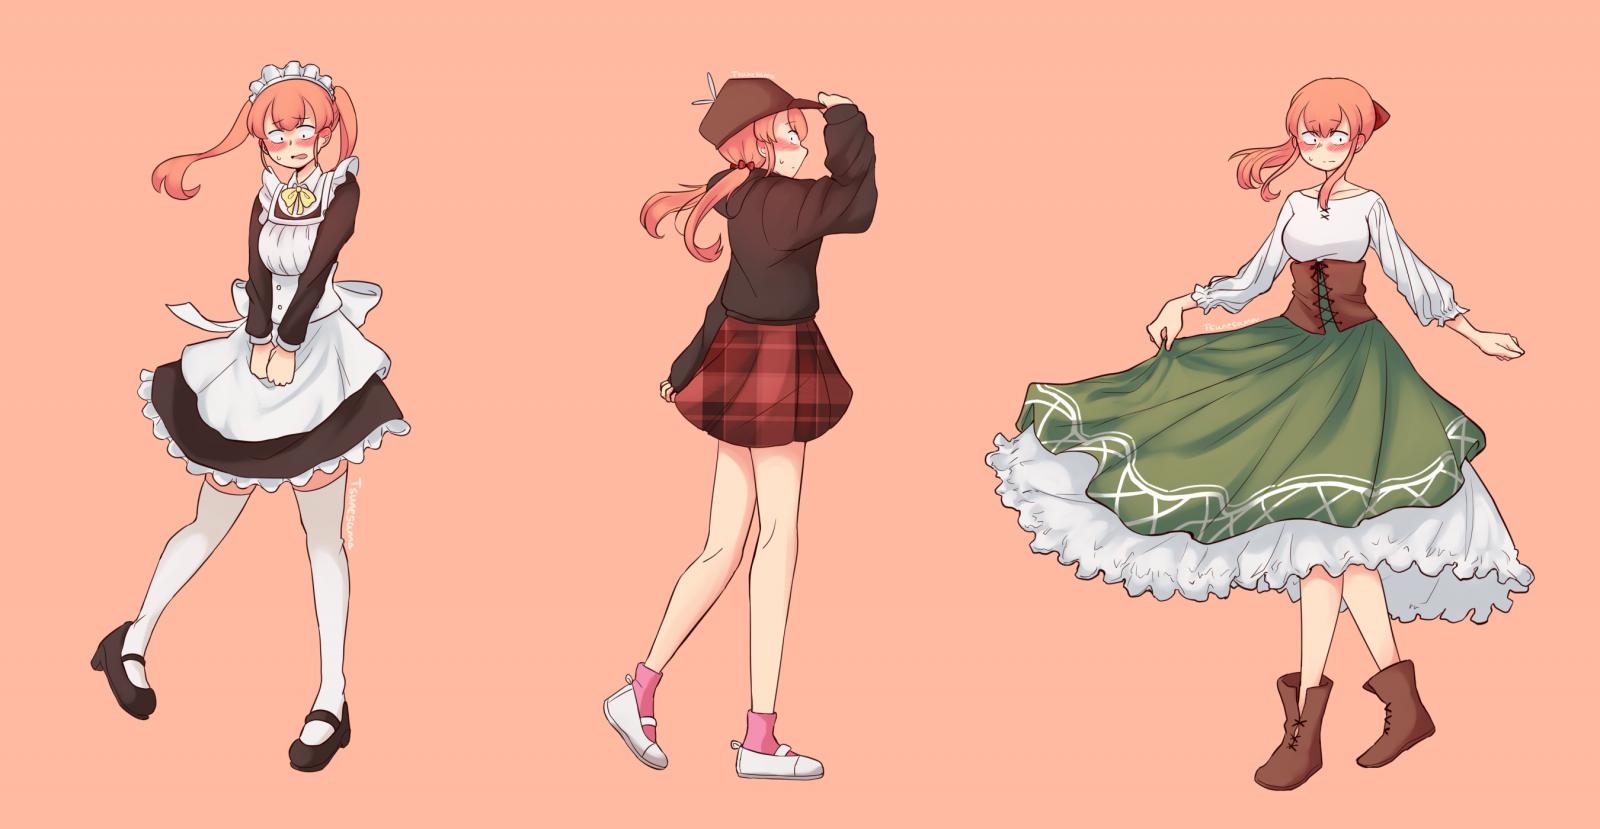 Crossdress anime